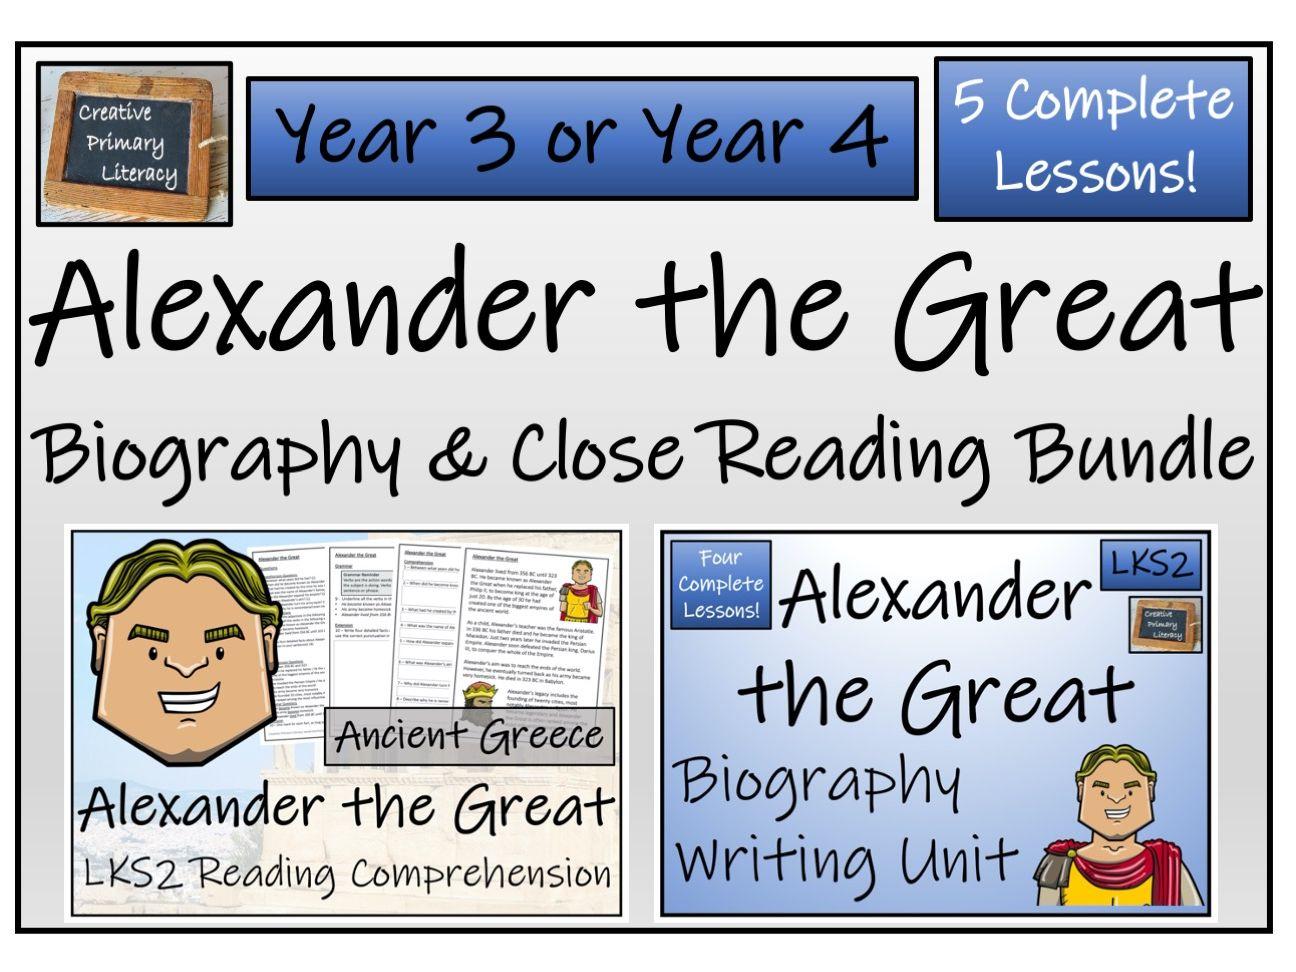 LKS2 History Alexander the Great Reading Comprehension & Biography Bundle